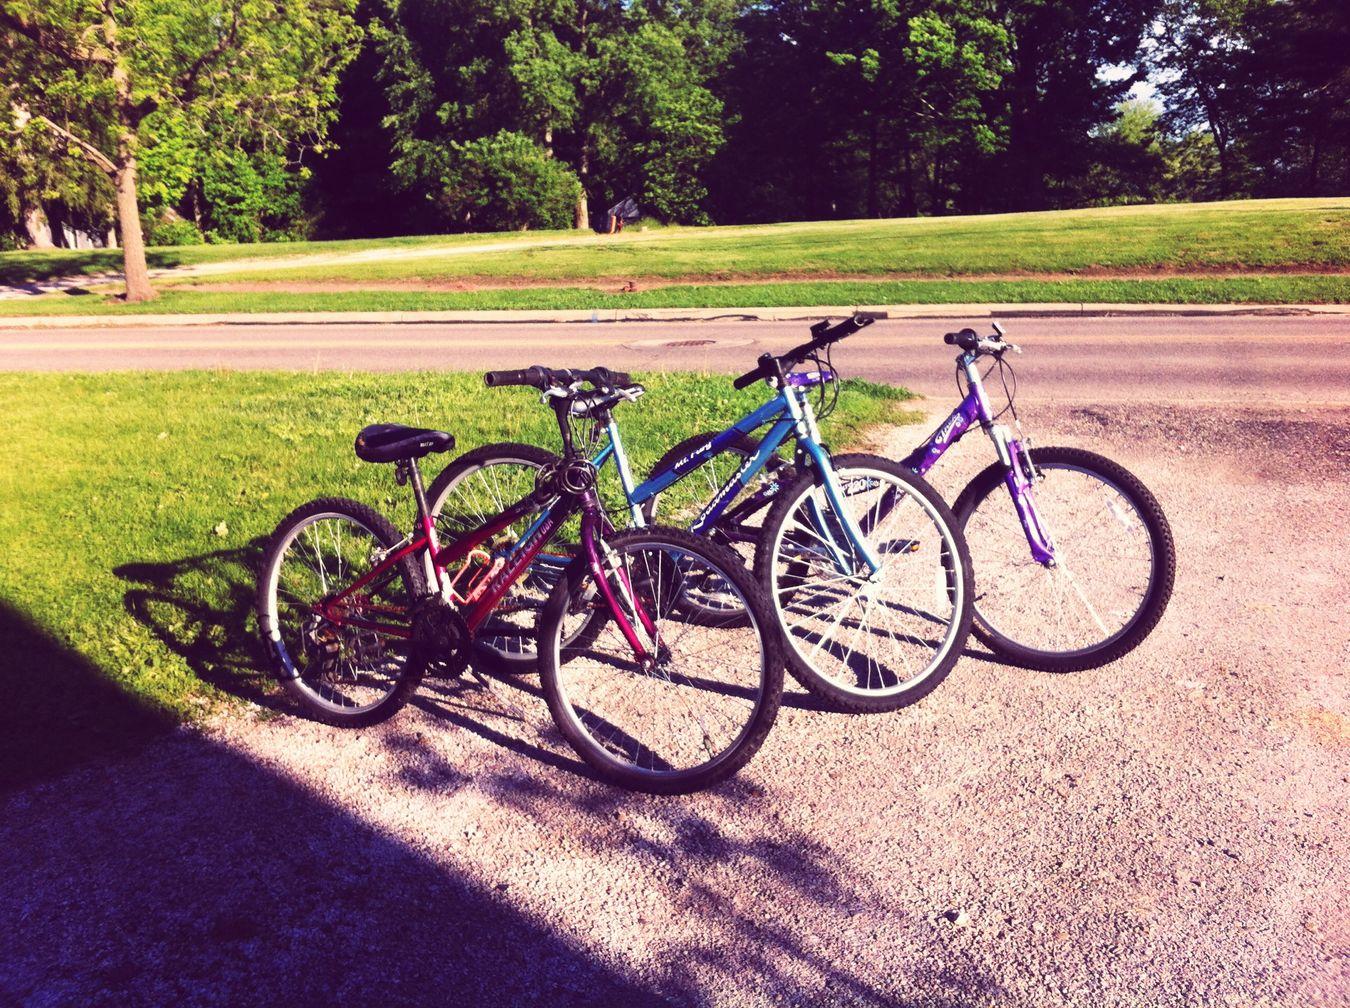 BikerGang2015 Posí